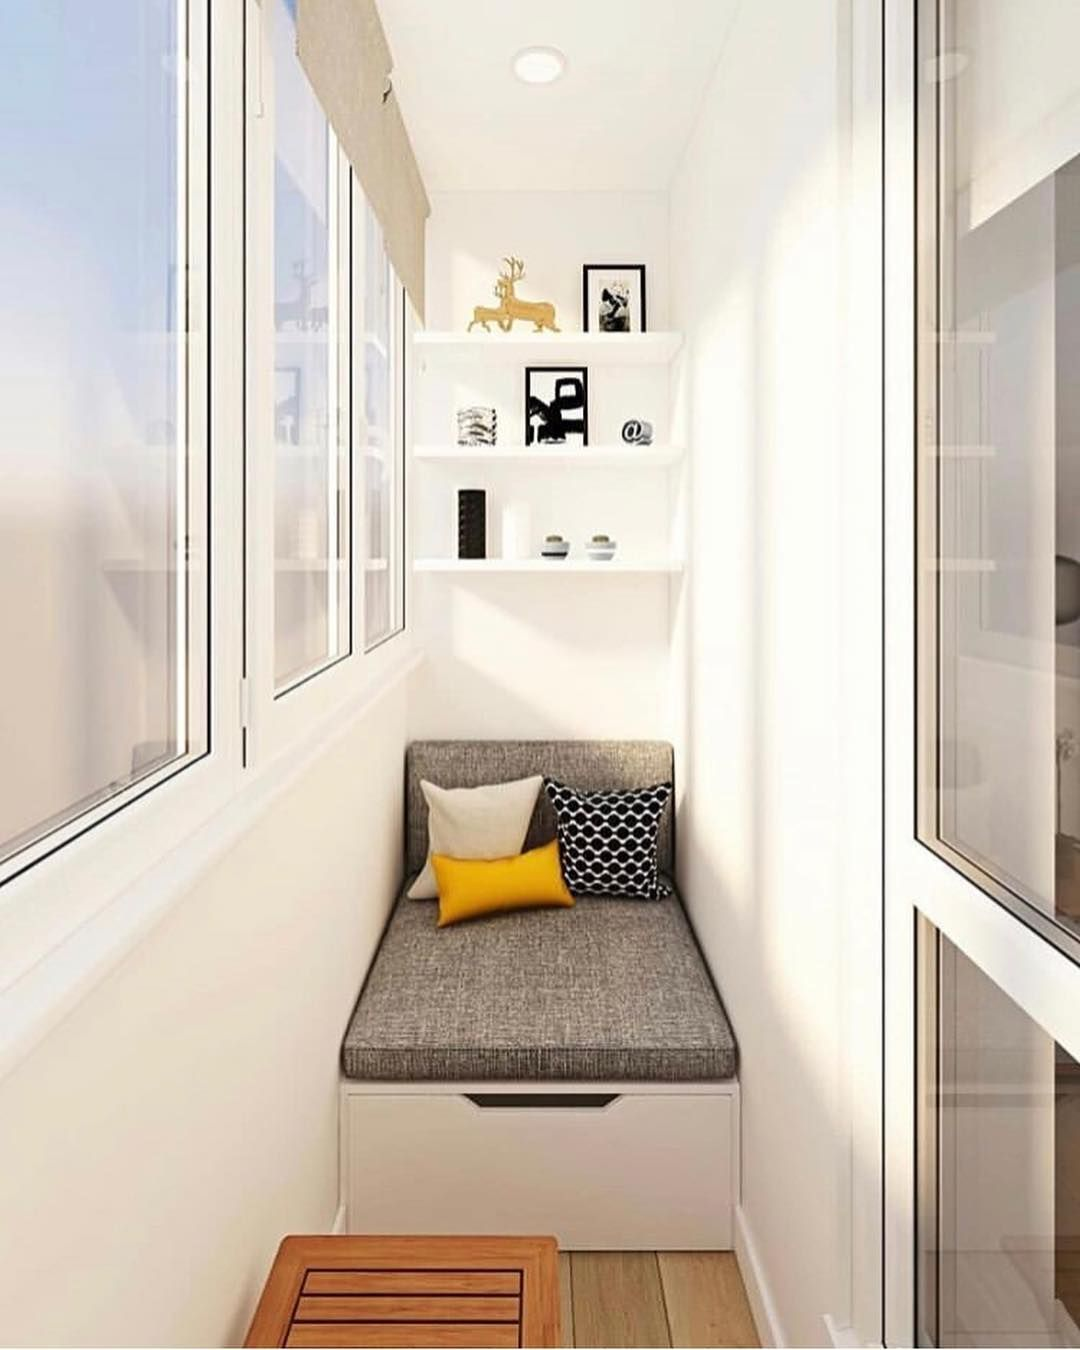 Living Room Balcony Design: 21 Cozy And Stylish Small Balcony Design Ideas In 2020